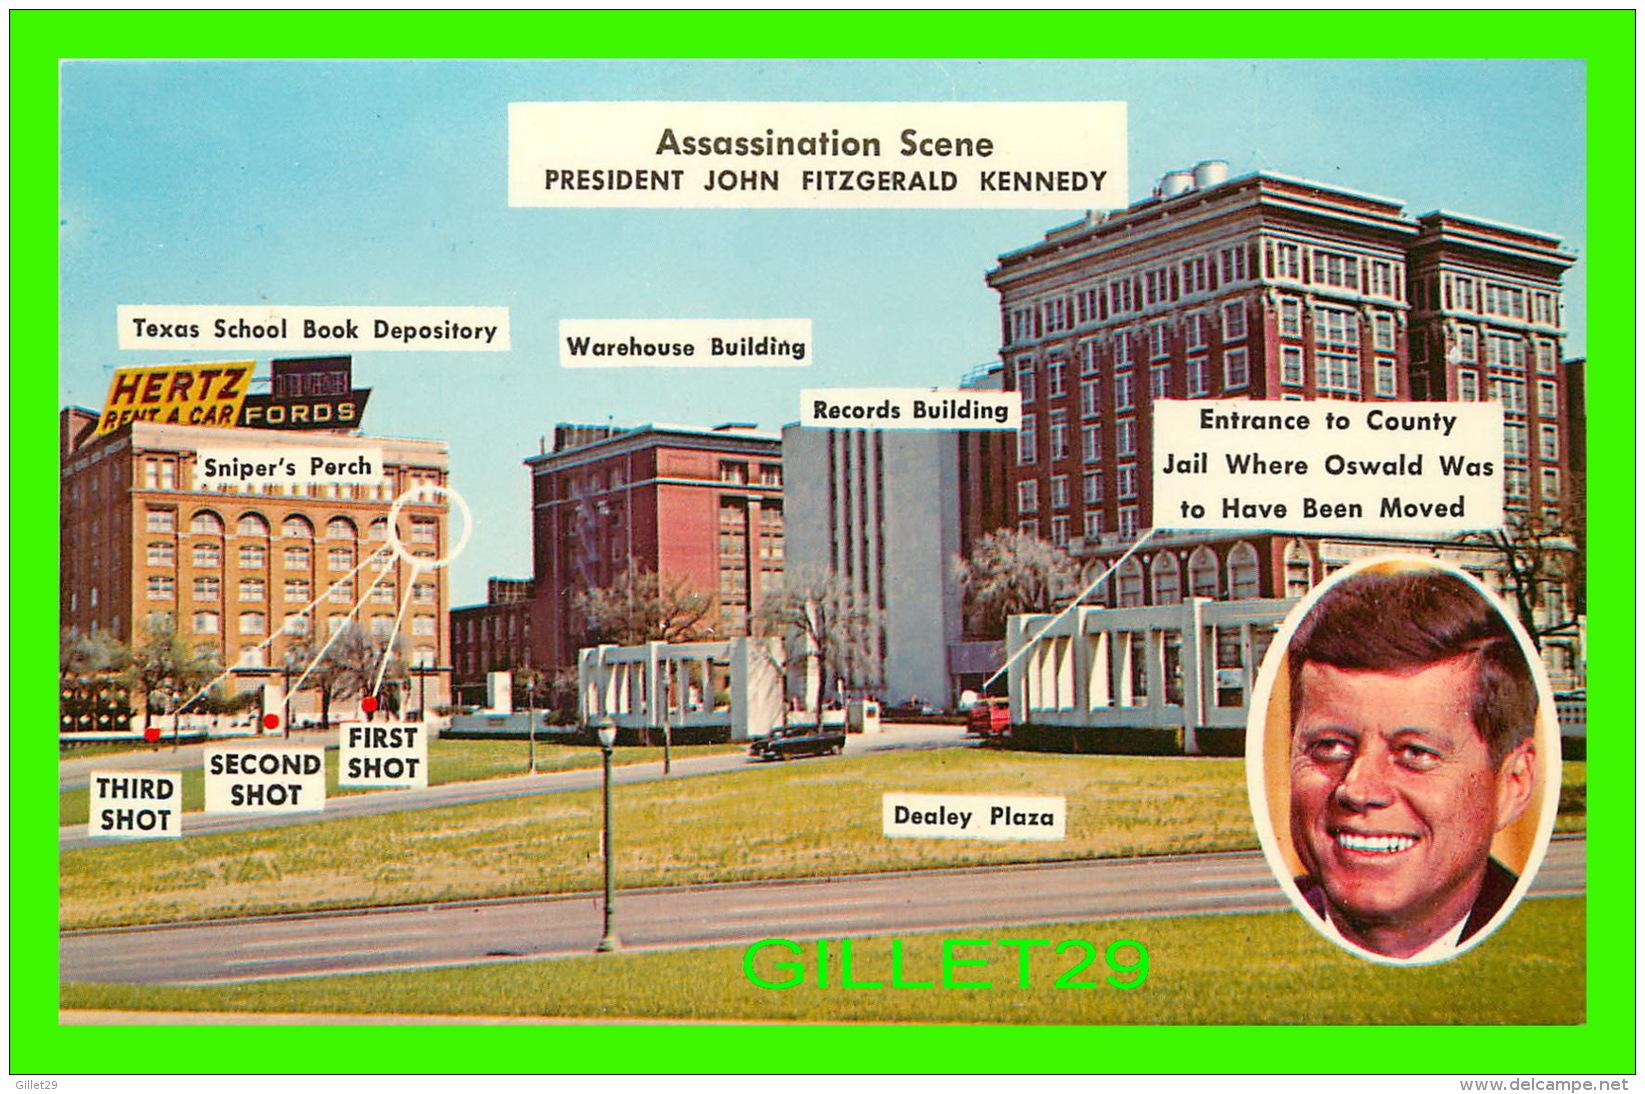 DALLAS, TX - ASSASSINATION SECNE OF PRESIDENT JOHN FITZGERALD KENNEDY IN 1963 -  BAXTER LANE POST CARD CO - - Dallas